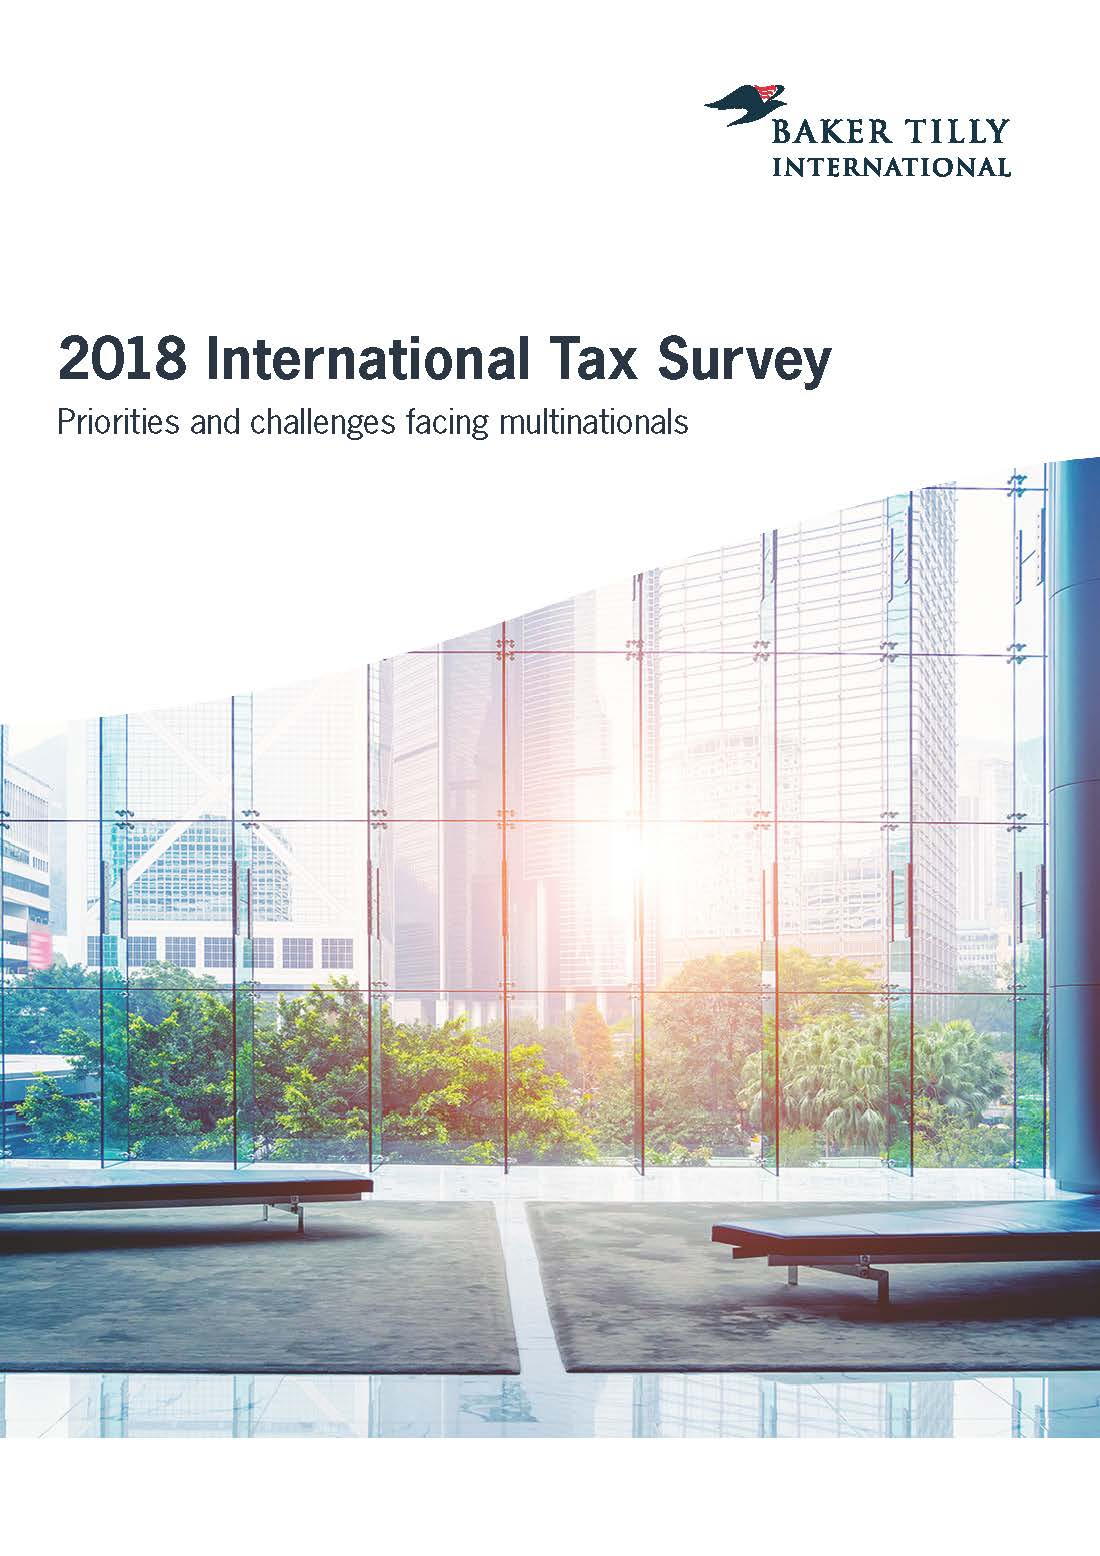 2018 International Tax Survey